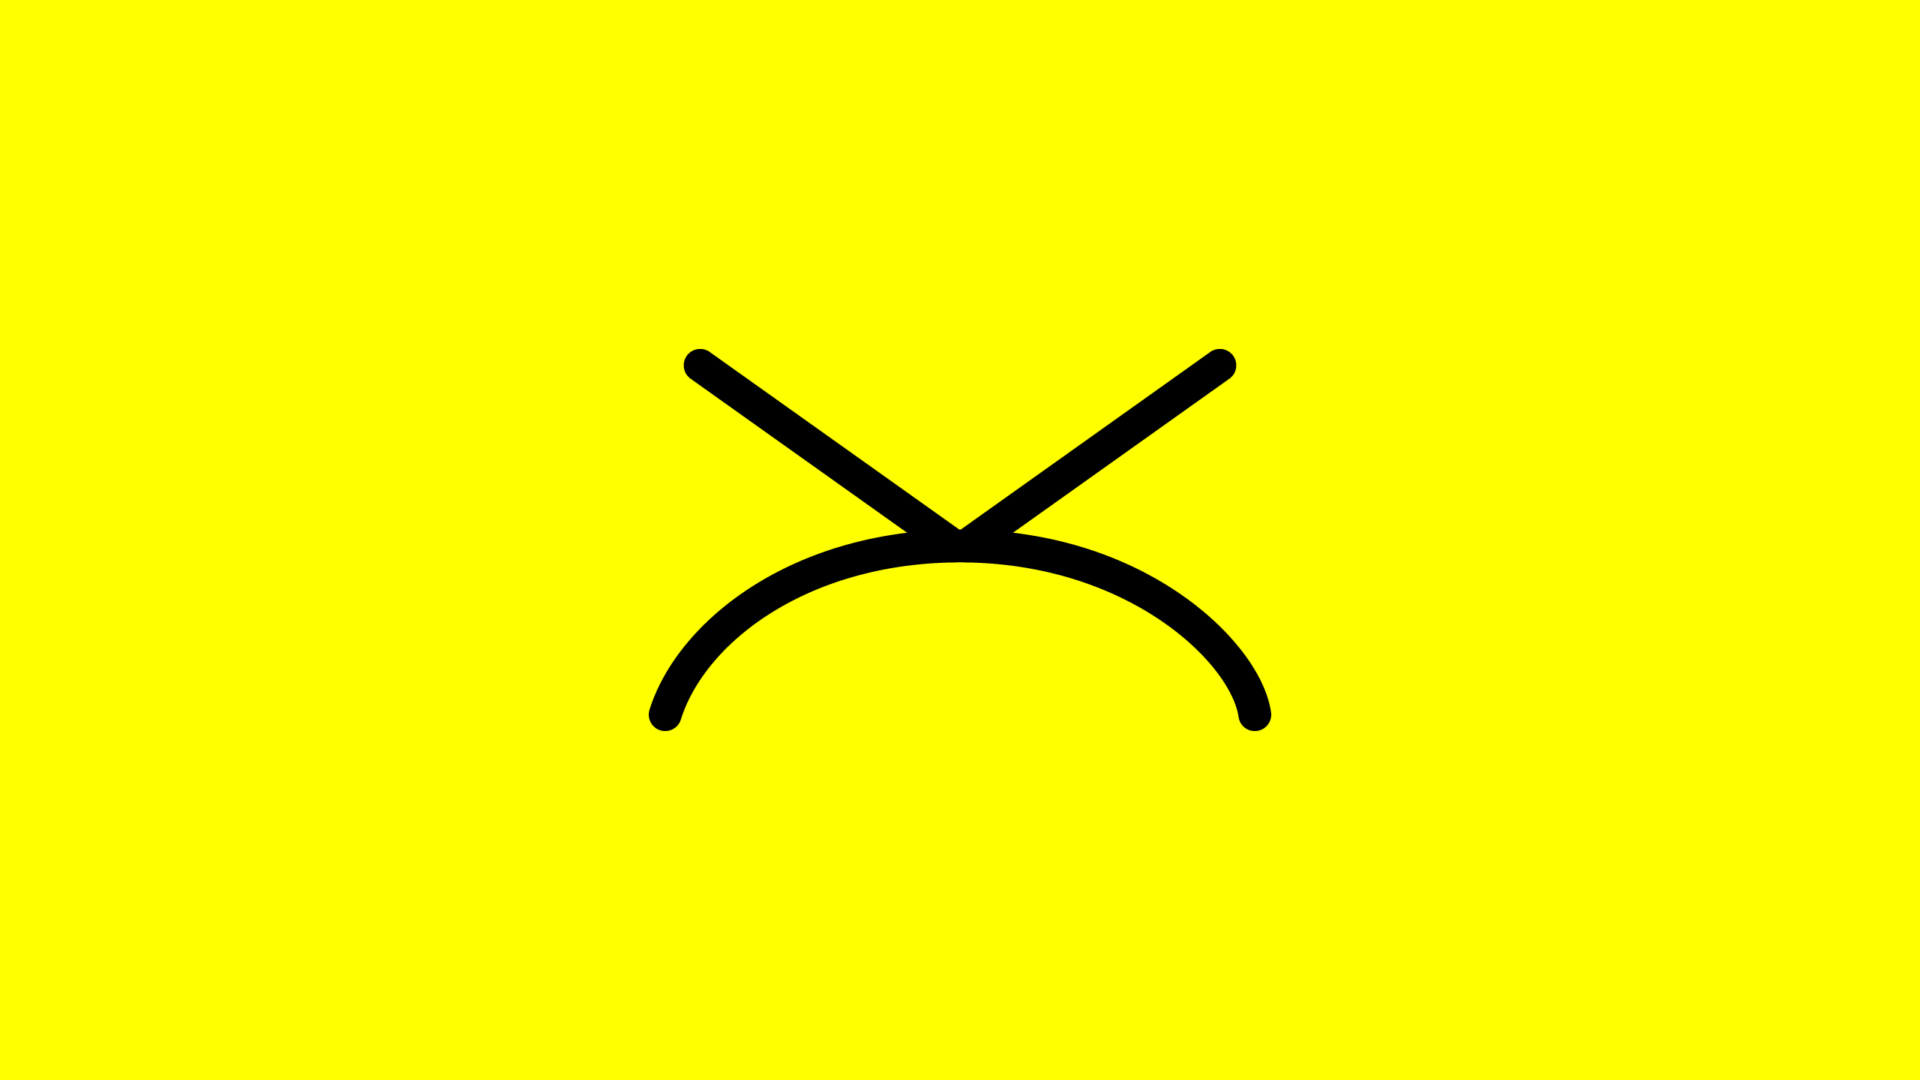 X detail